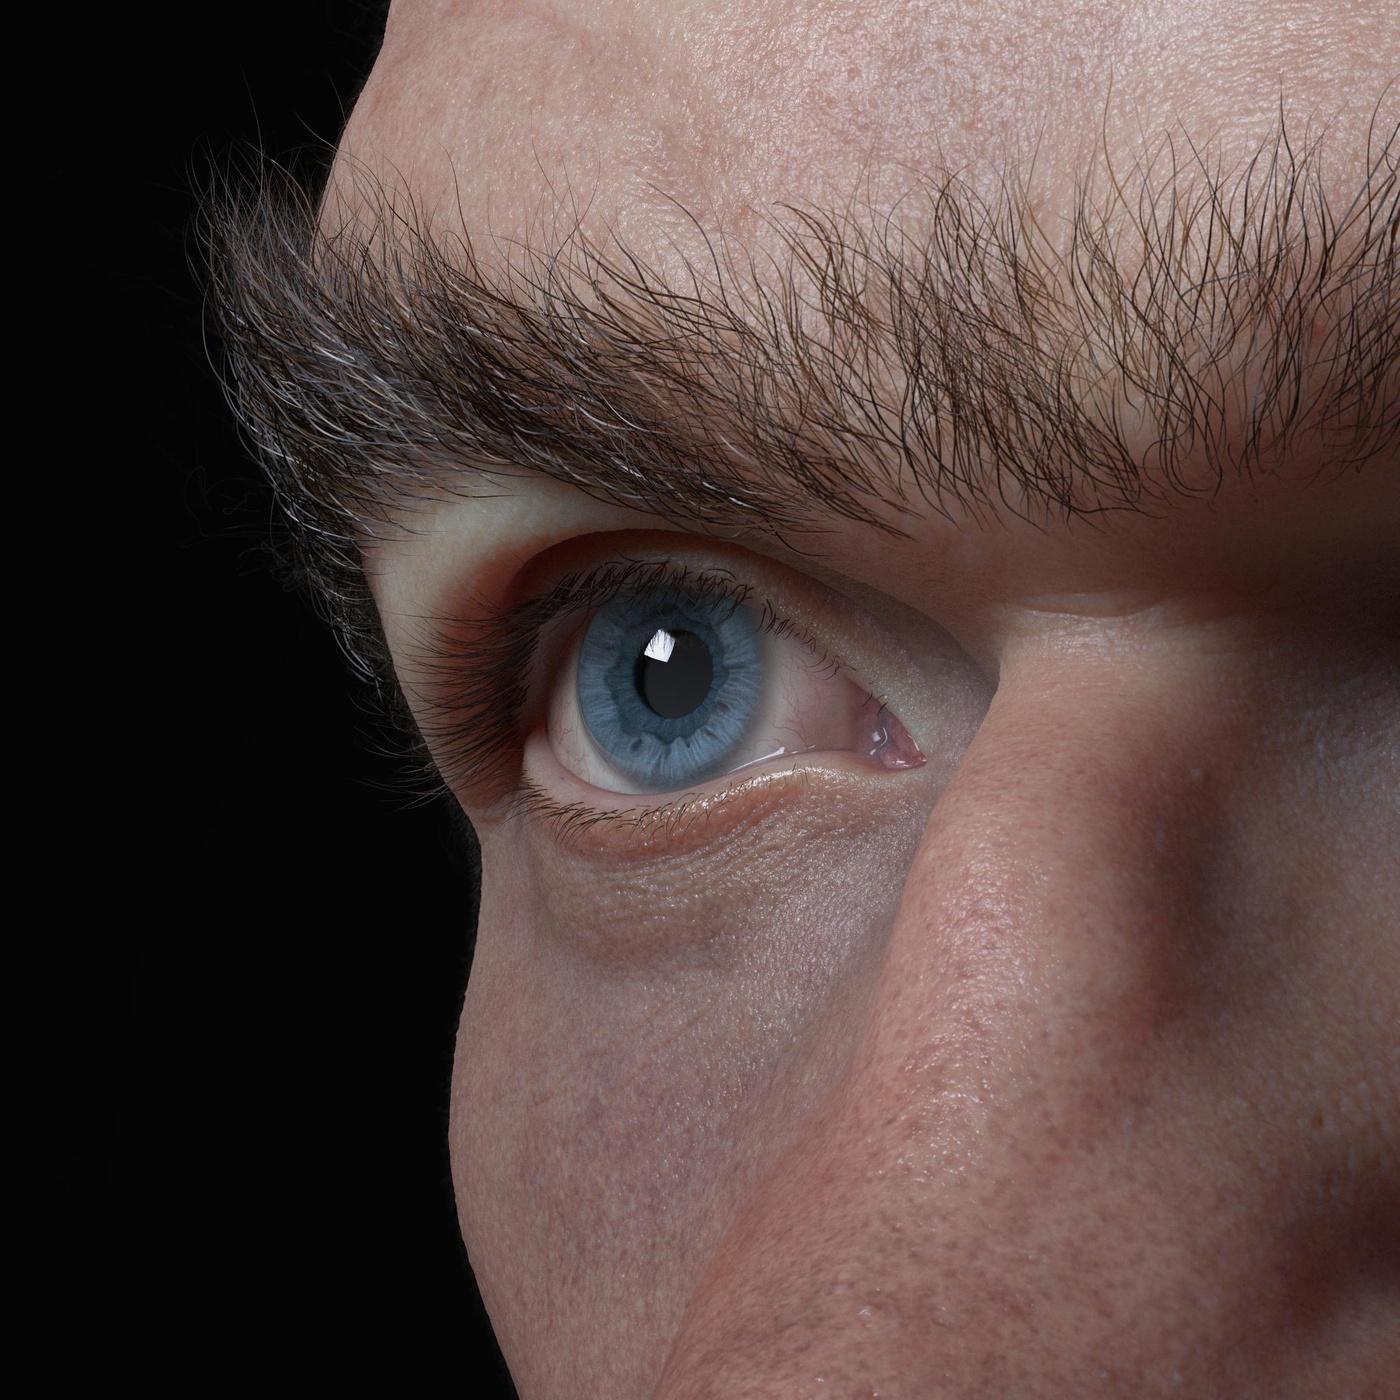 realistic eye iris character design model render 3d